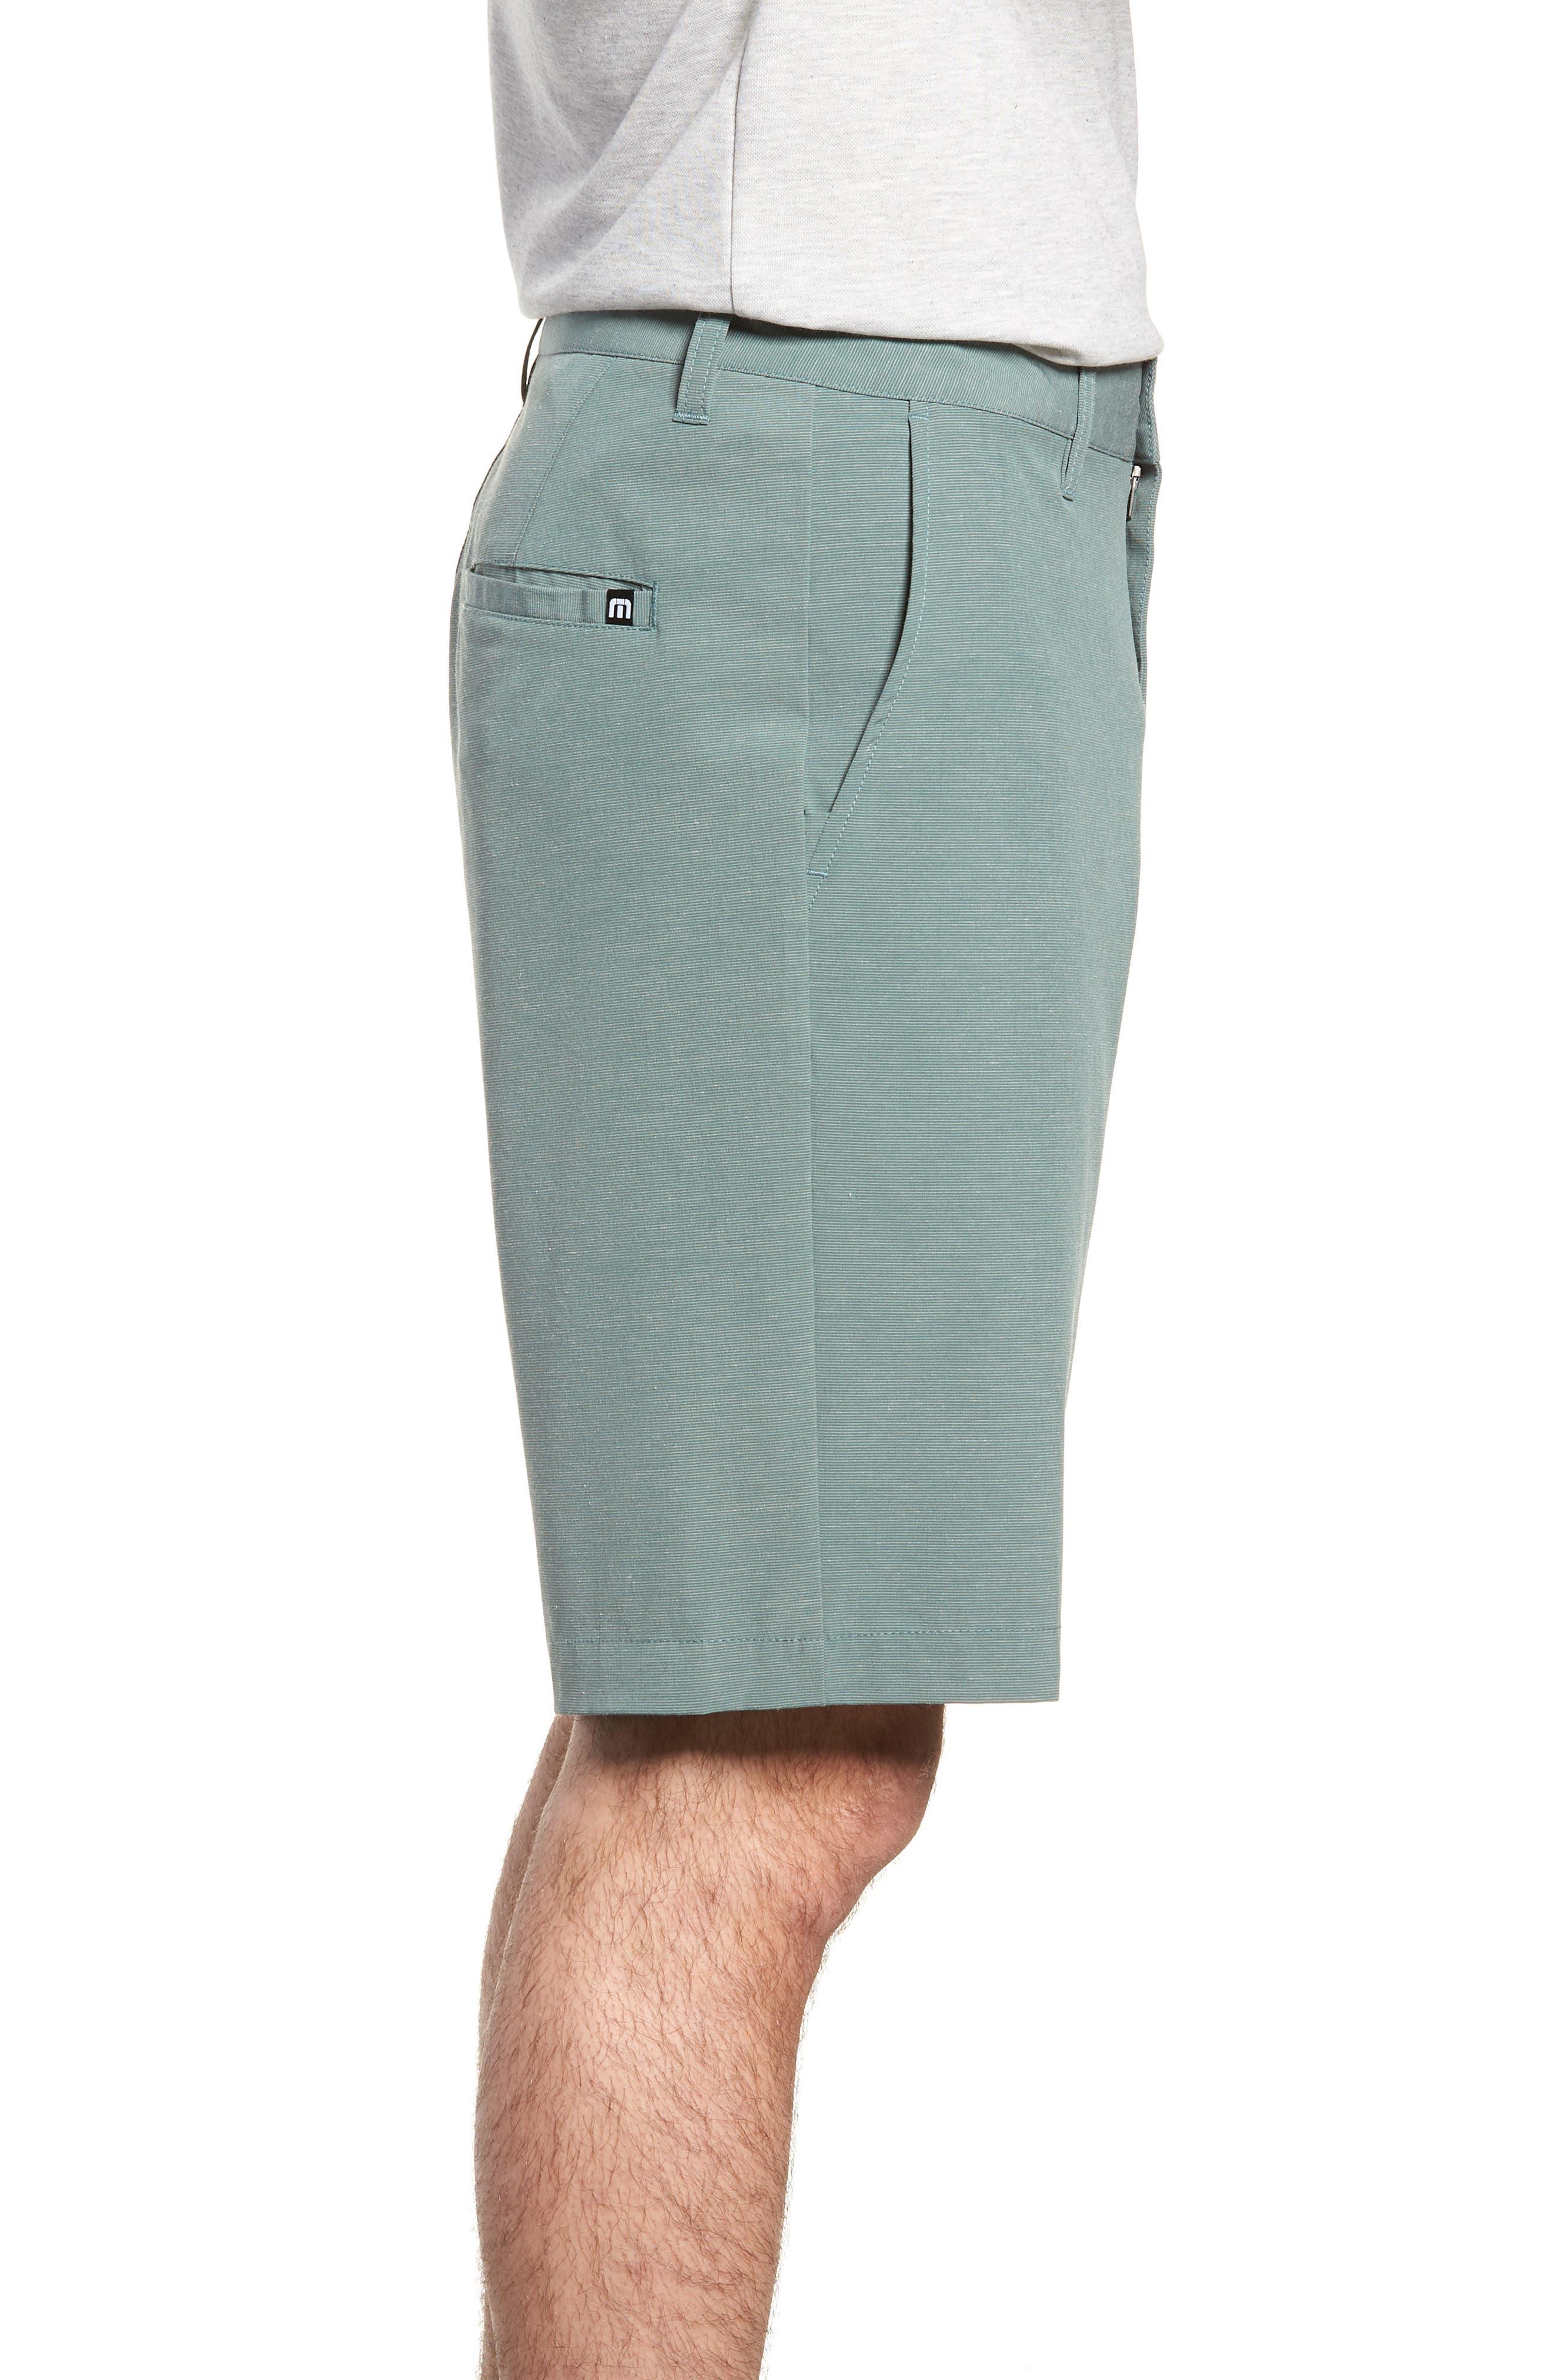 Revival Shorts,                             Alternate thumbnail 3, color,                             BALSAM GREEN